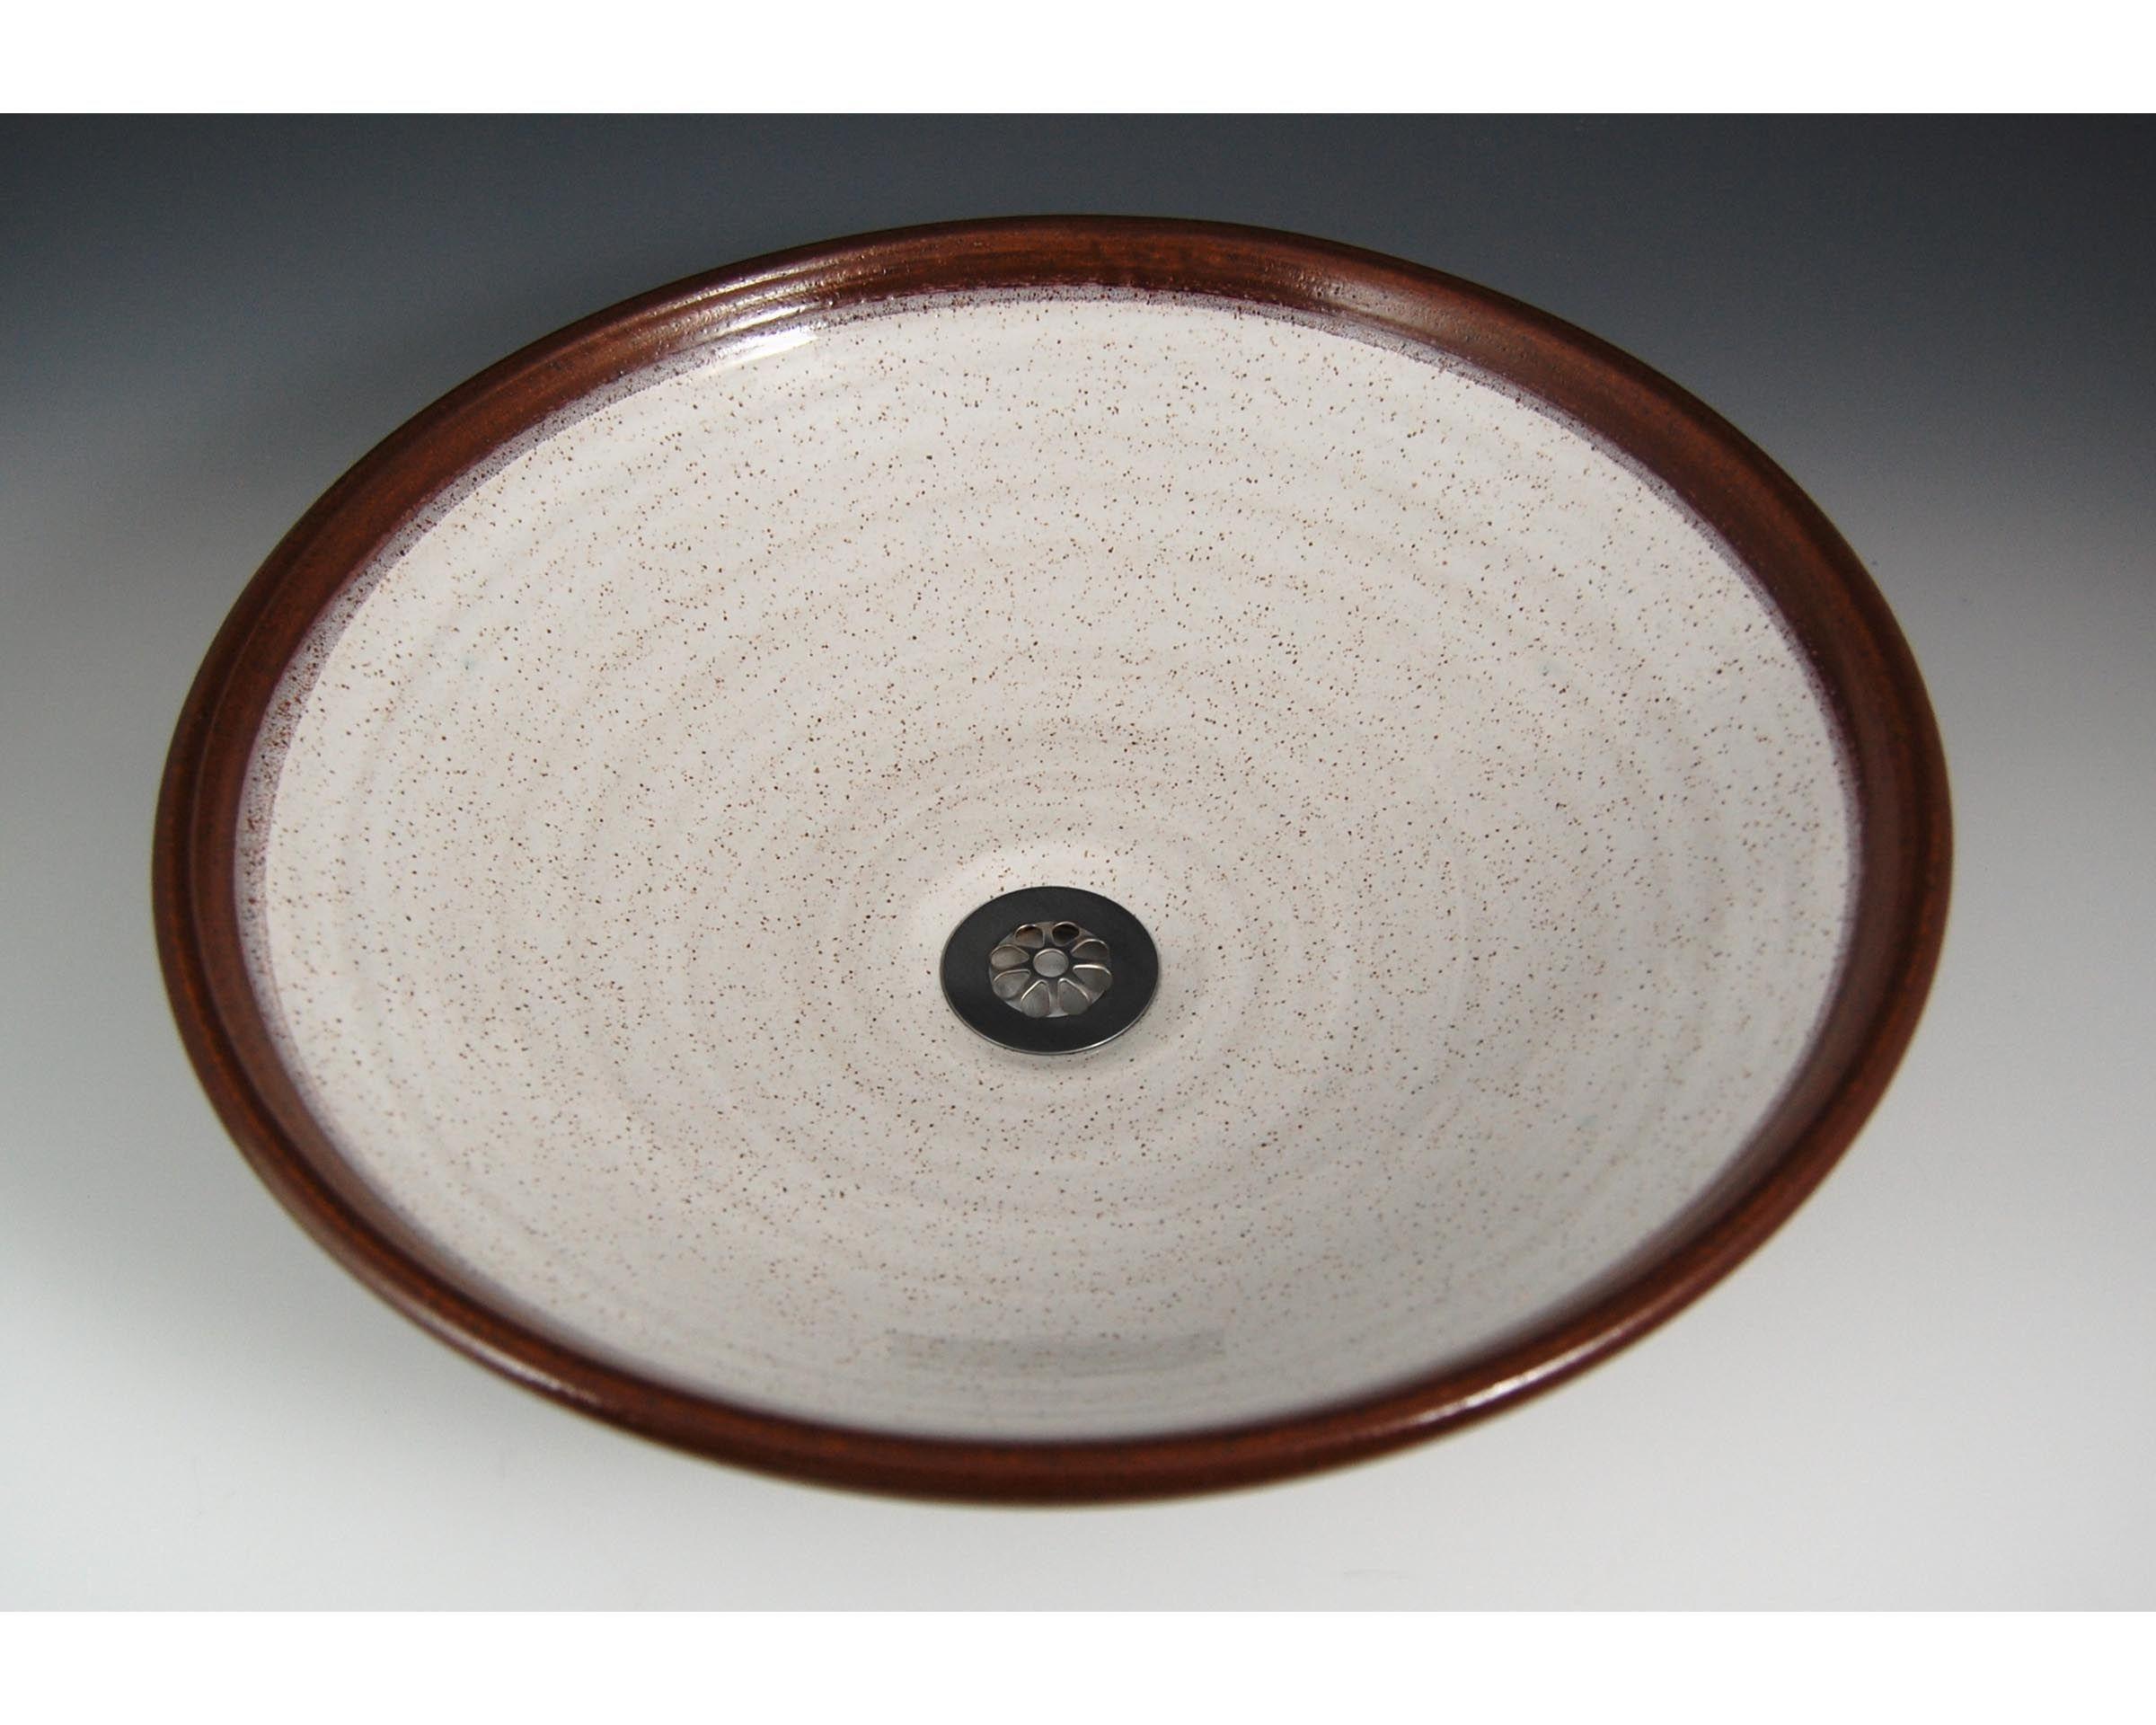 Sarefire Ceramic Vessel Sink Ceramic Vessel Vessel Sink Glass Vessel Sinks